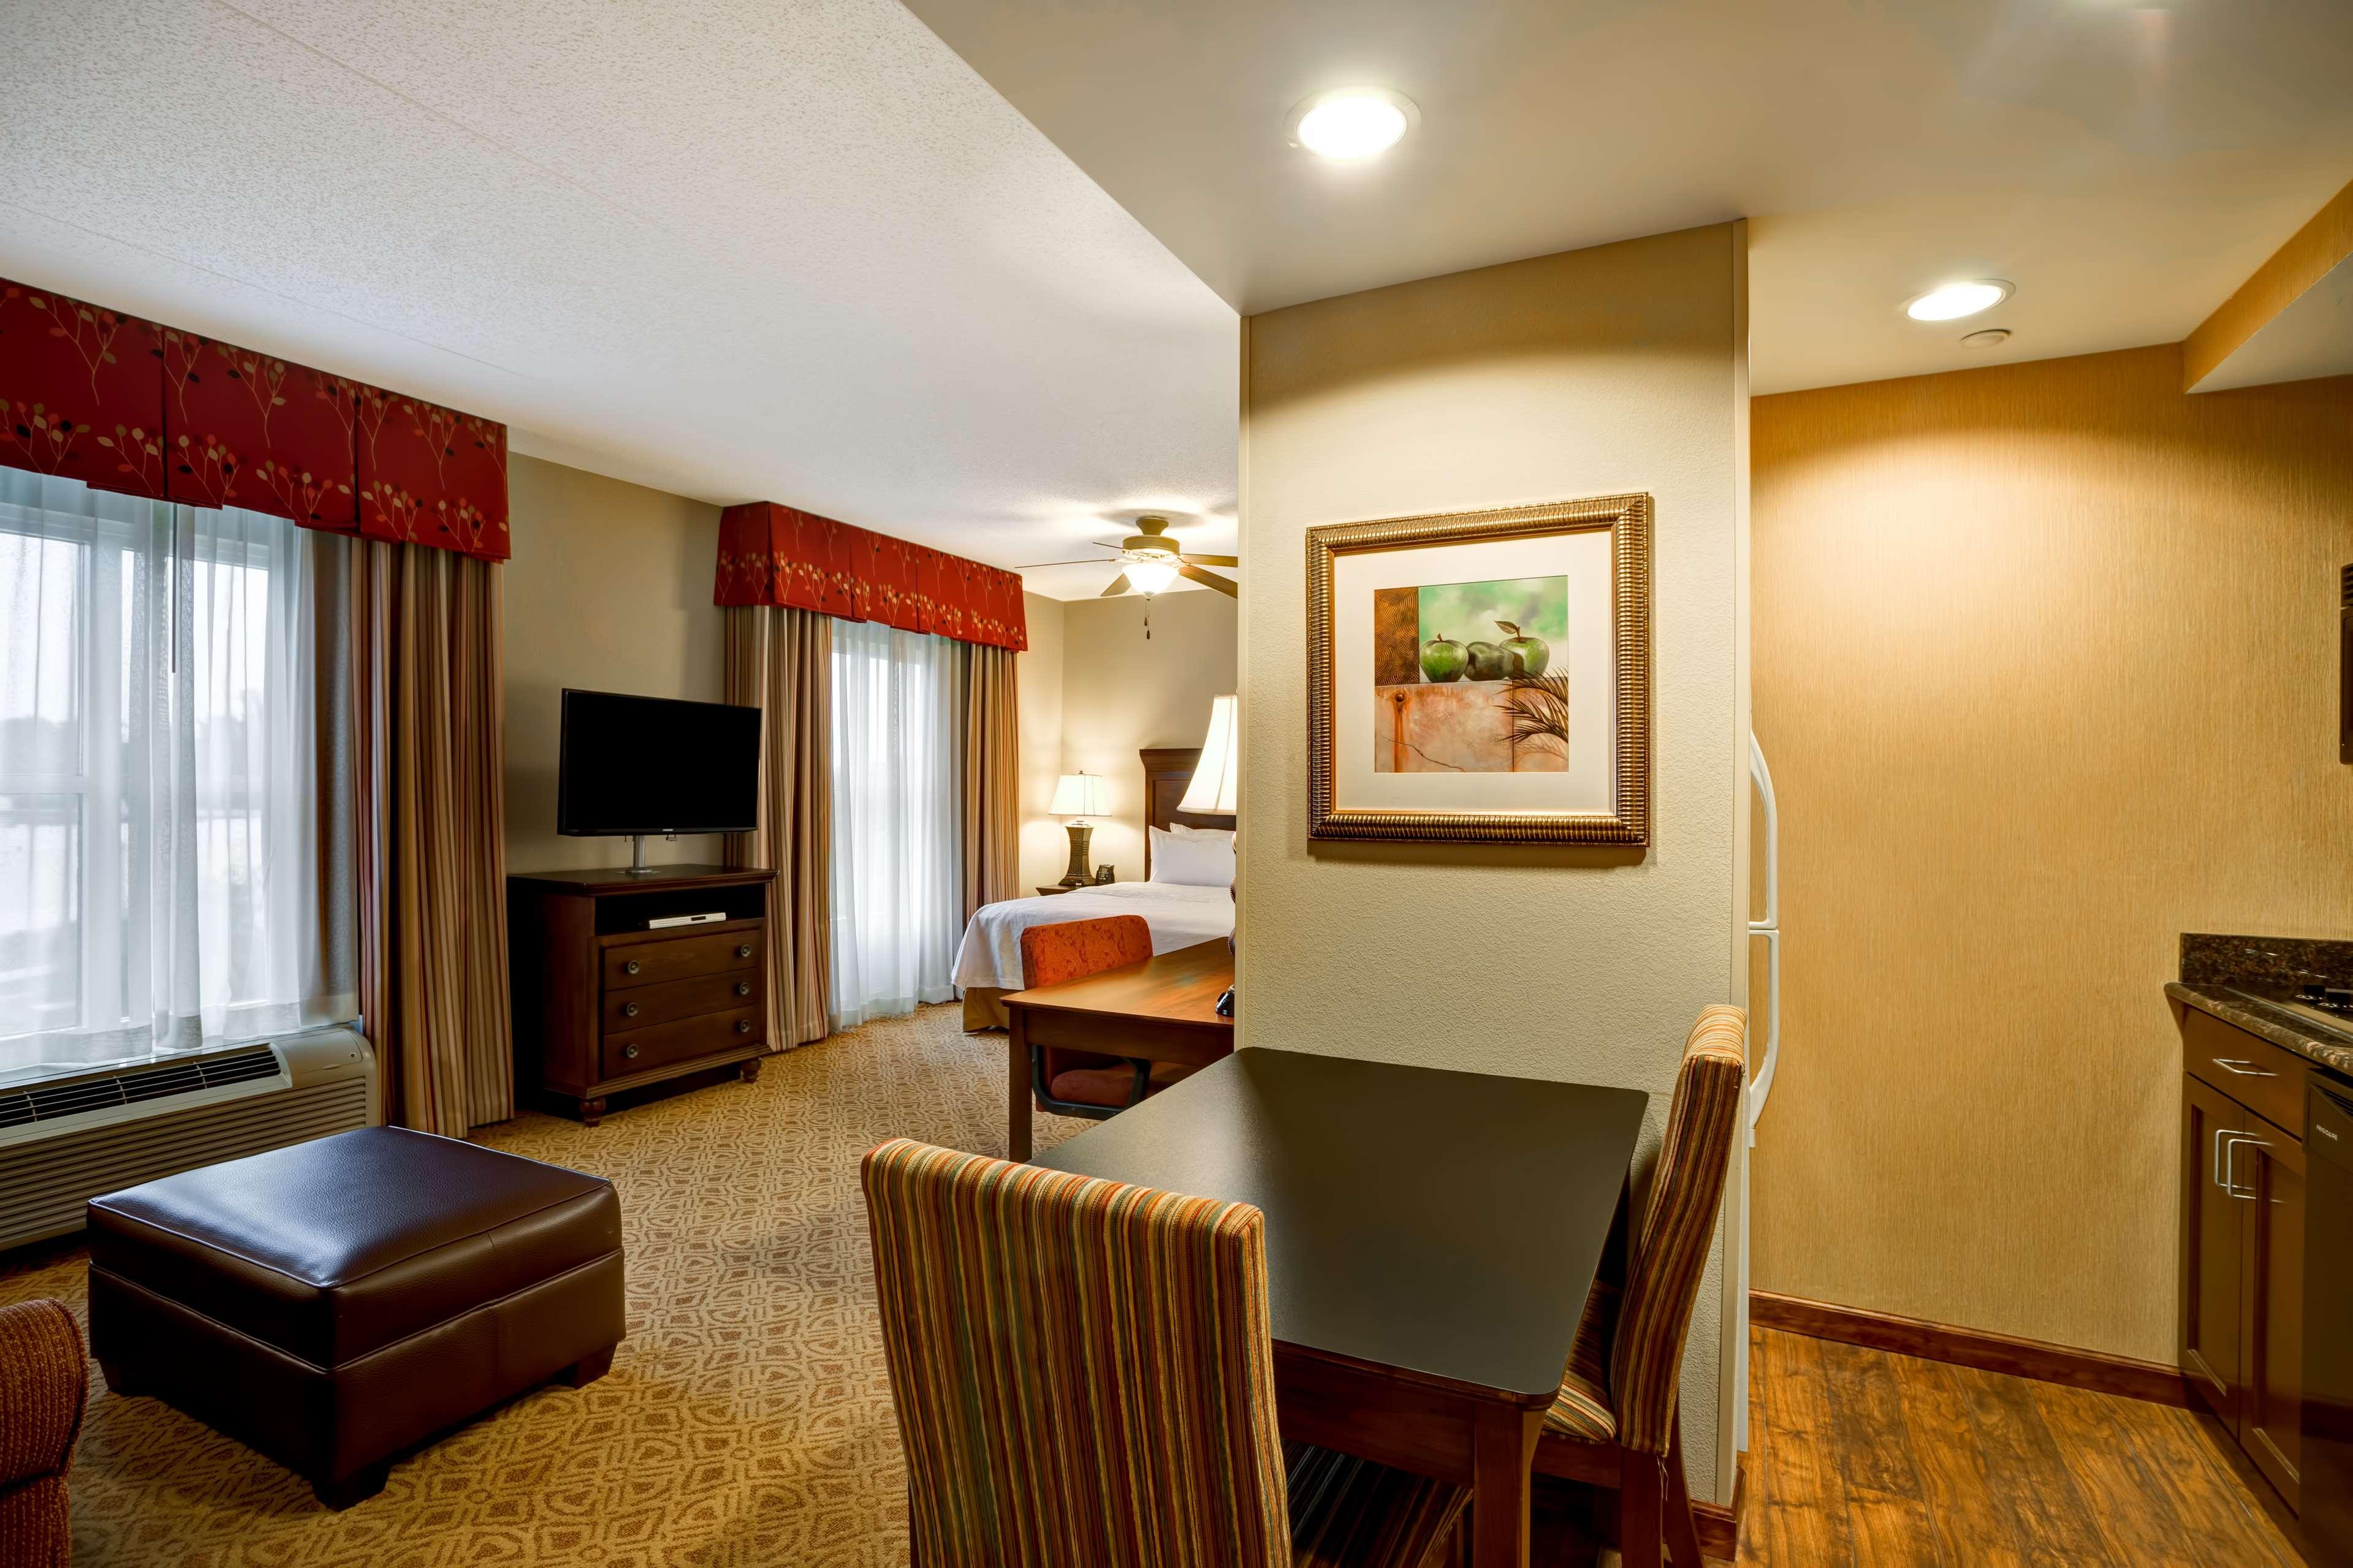 Homewood Suites by Hilton Fredericksburg image 30